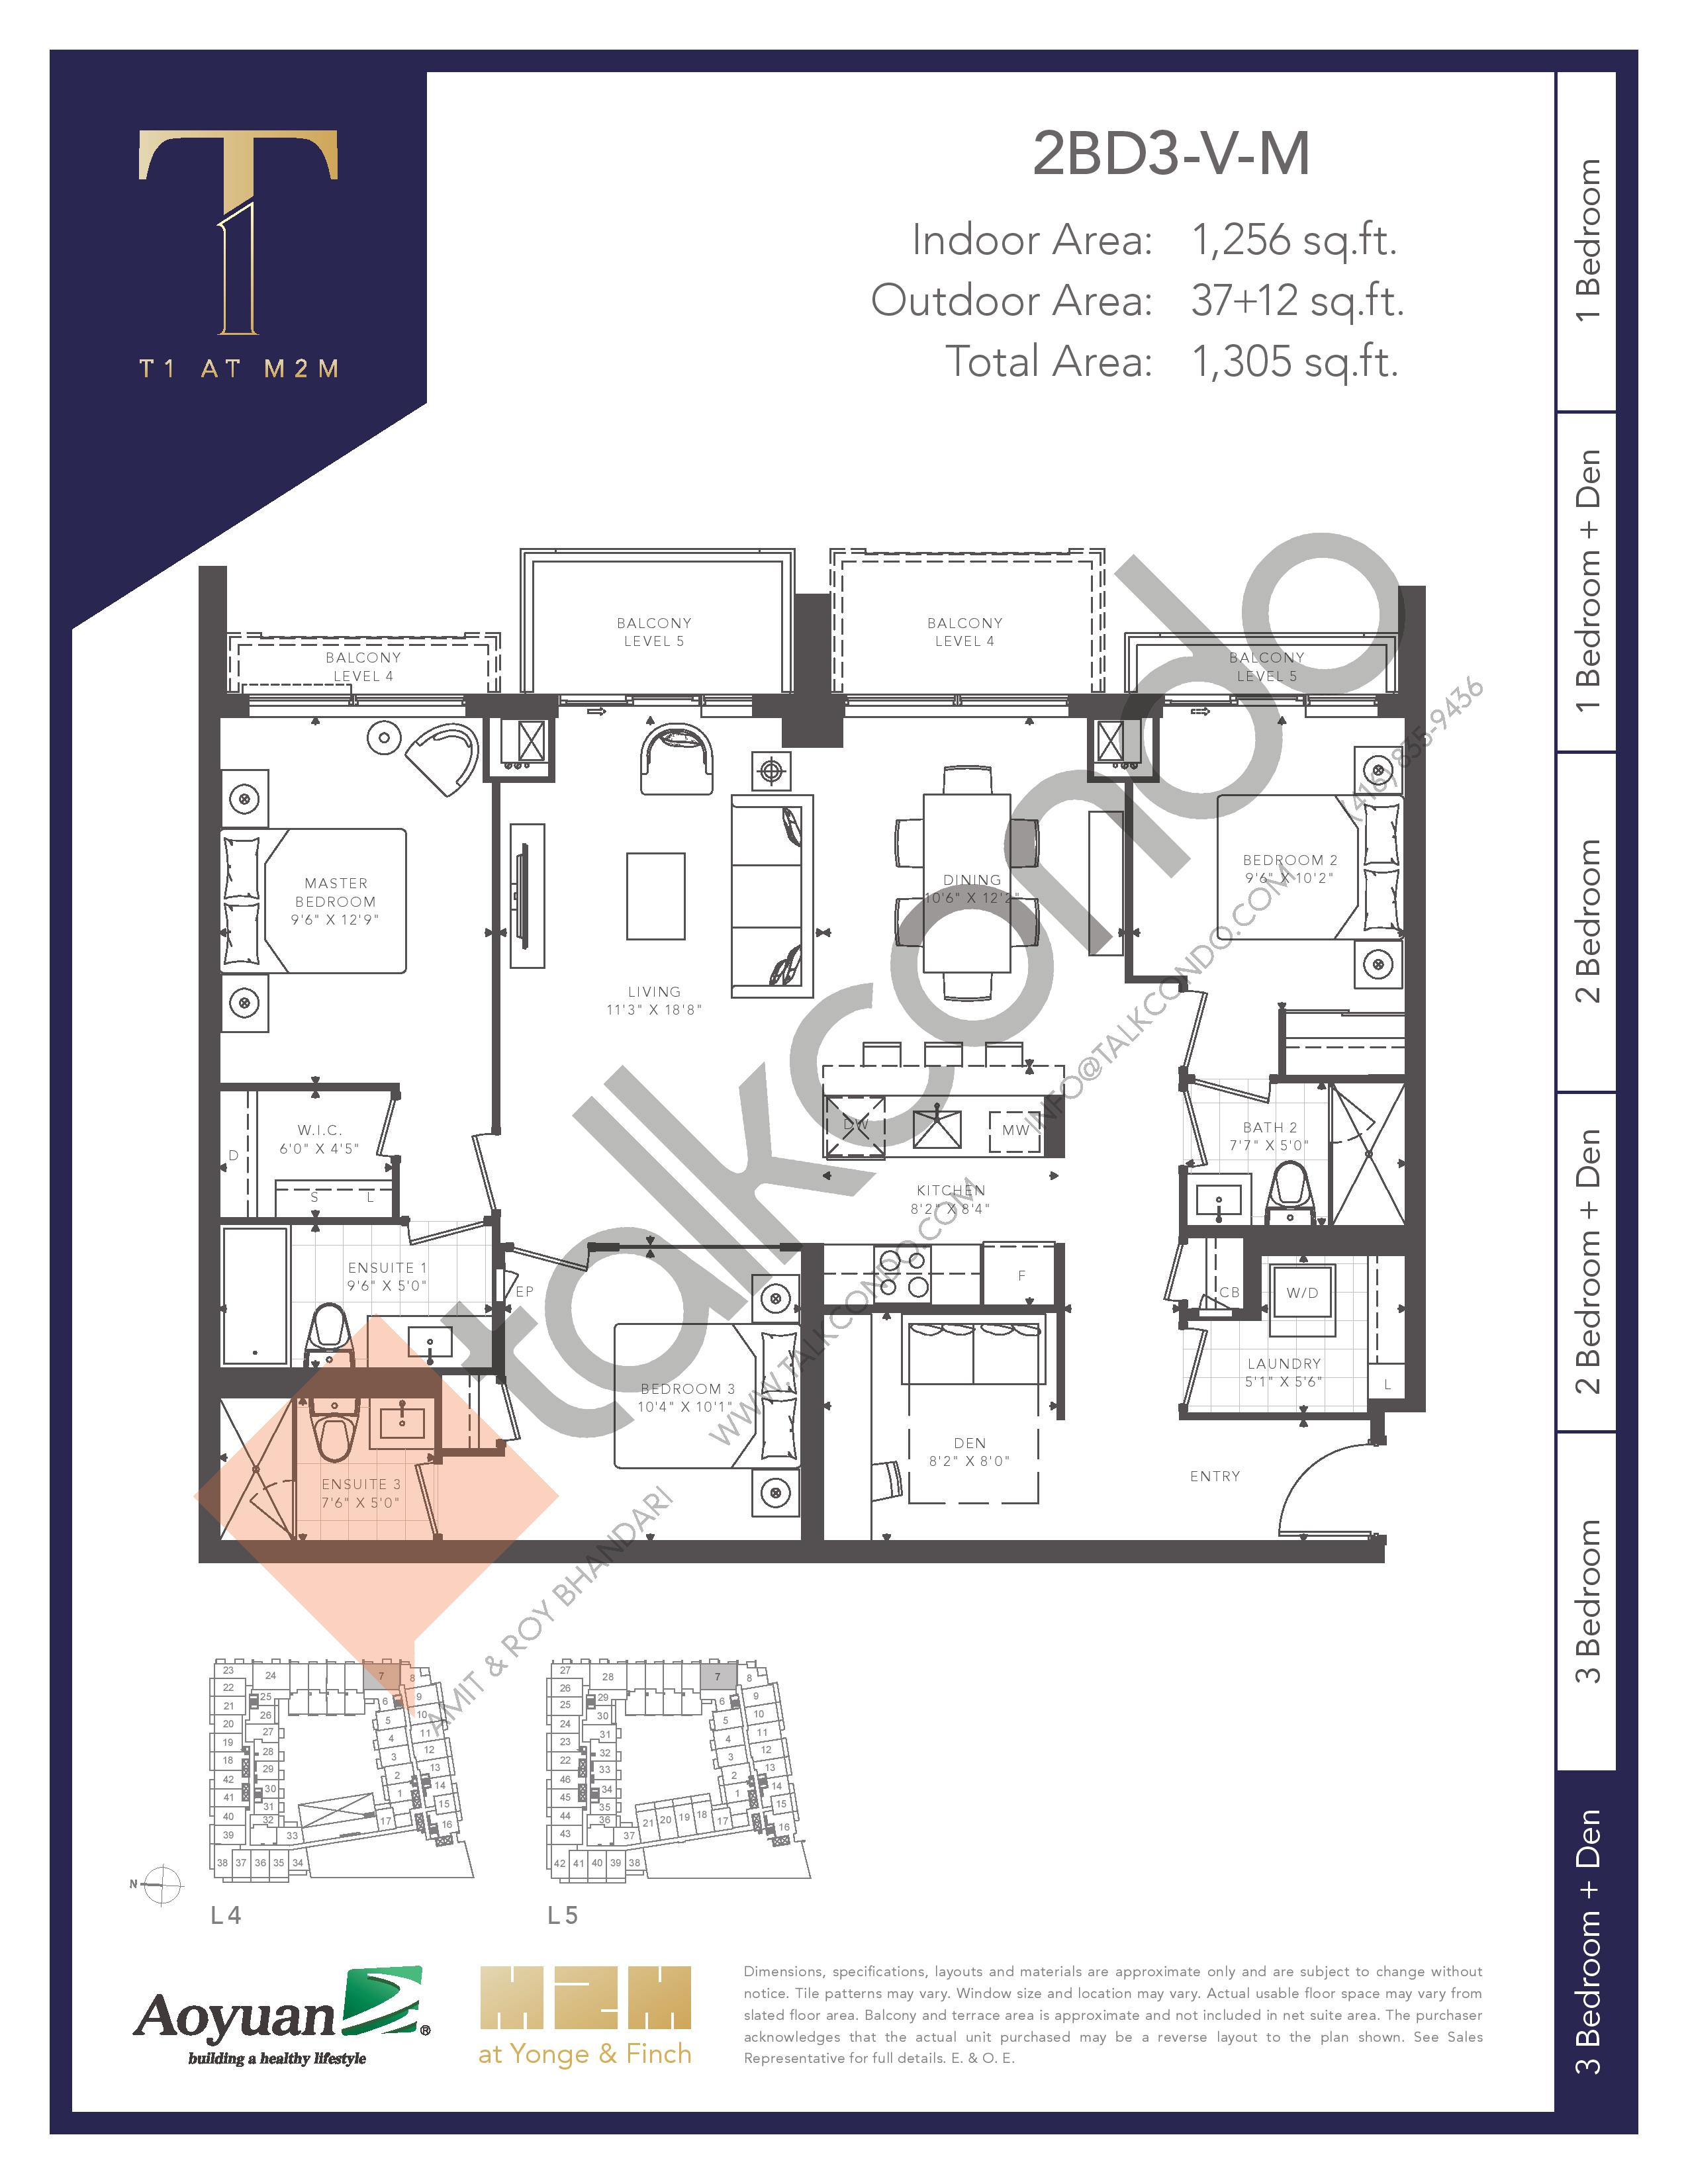 2BD3-V-M Floor Plan at T1 at M2M Condos - 1256 sq.ft